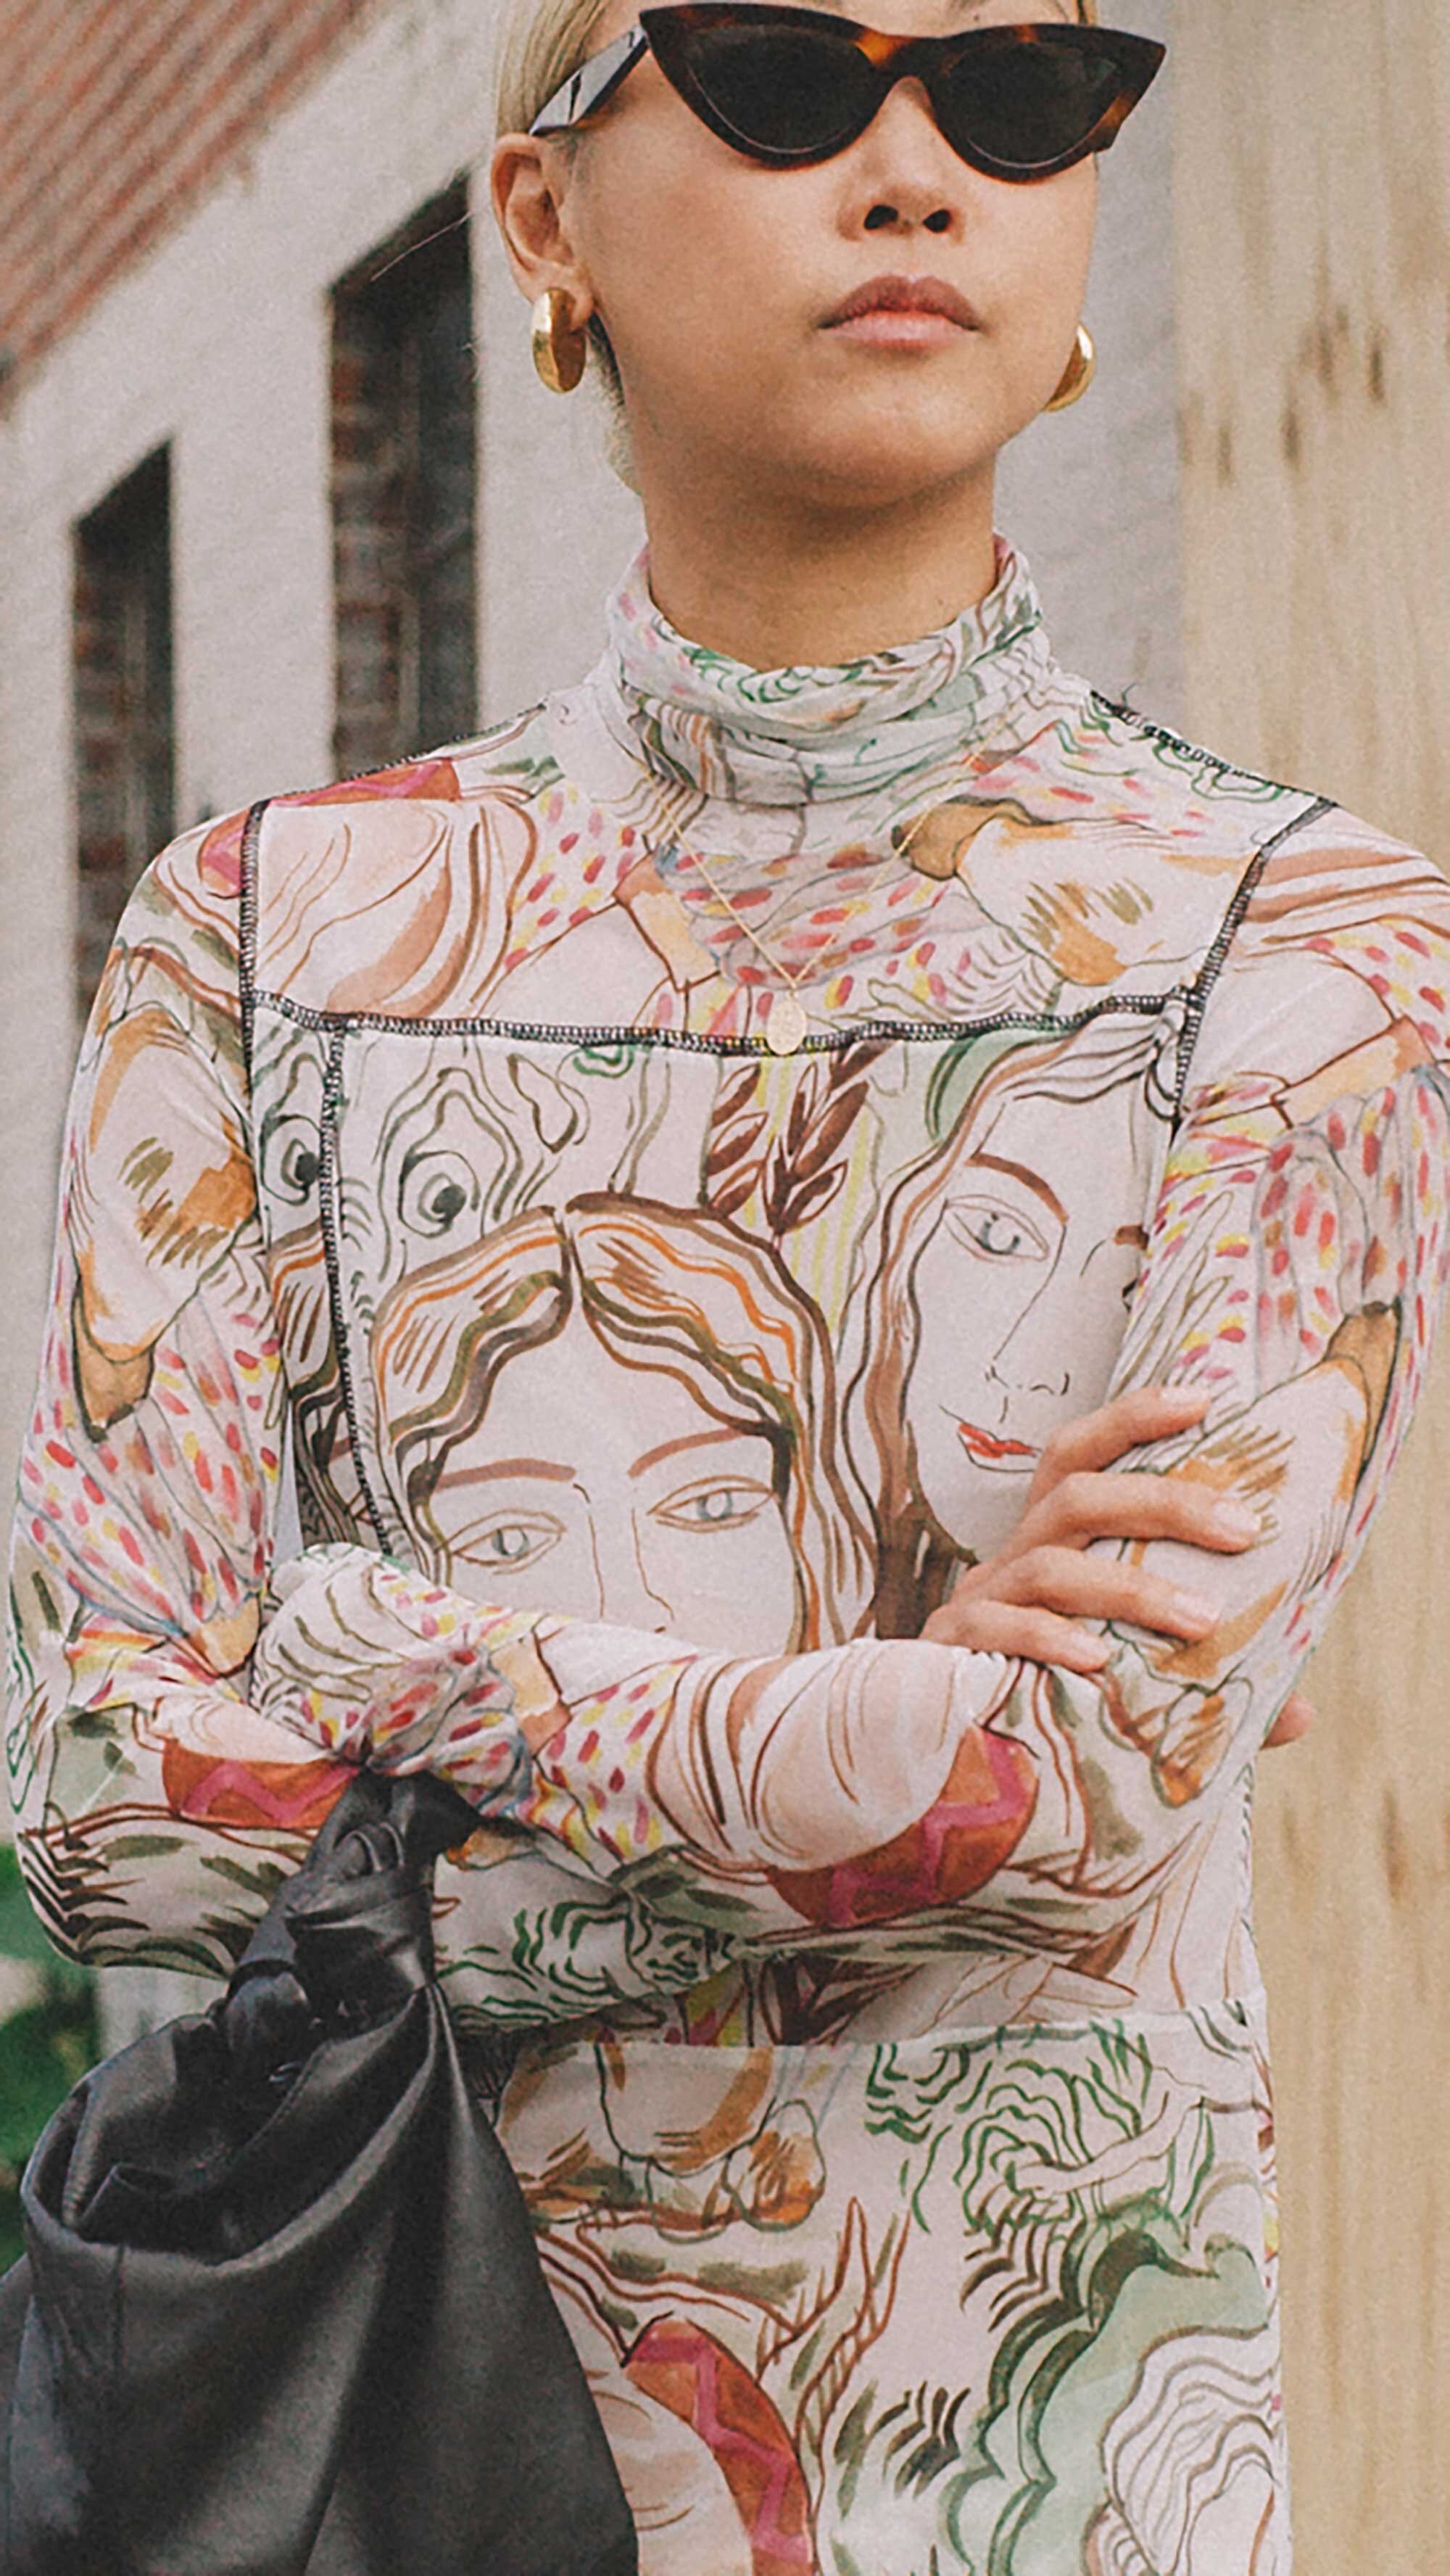 Click for more looks! Best outfits of New York Fashion Week street style 2019 Day Three Photo by @J2martinez Jose J. Martinez www.jmrtnz.com -79.jpg